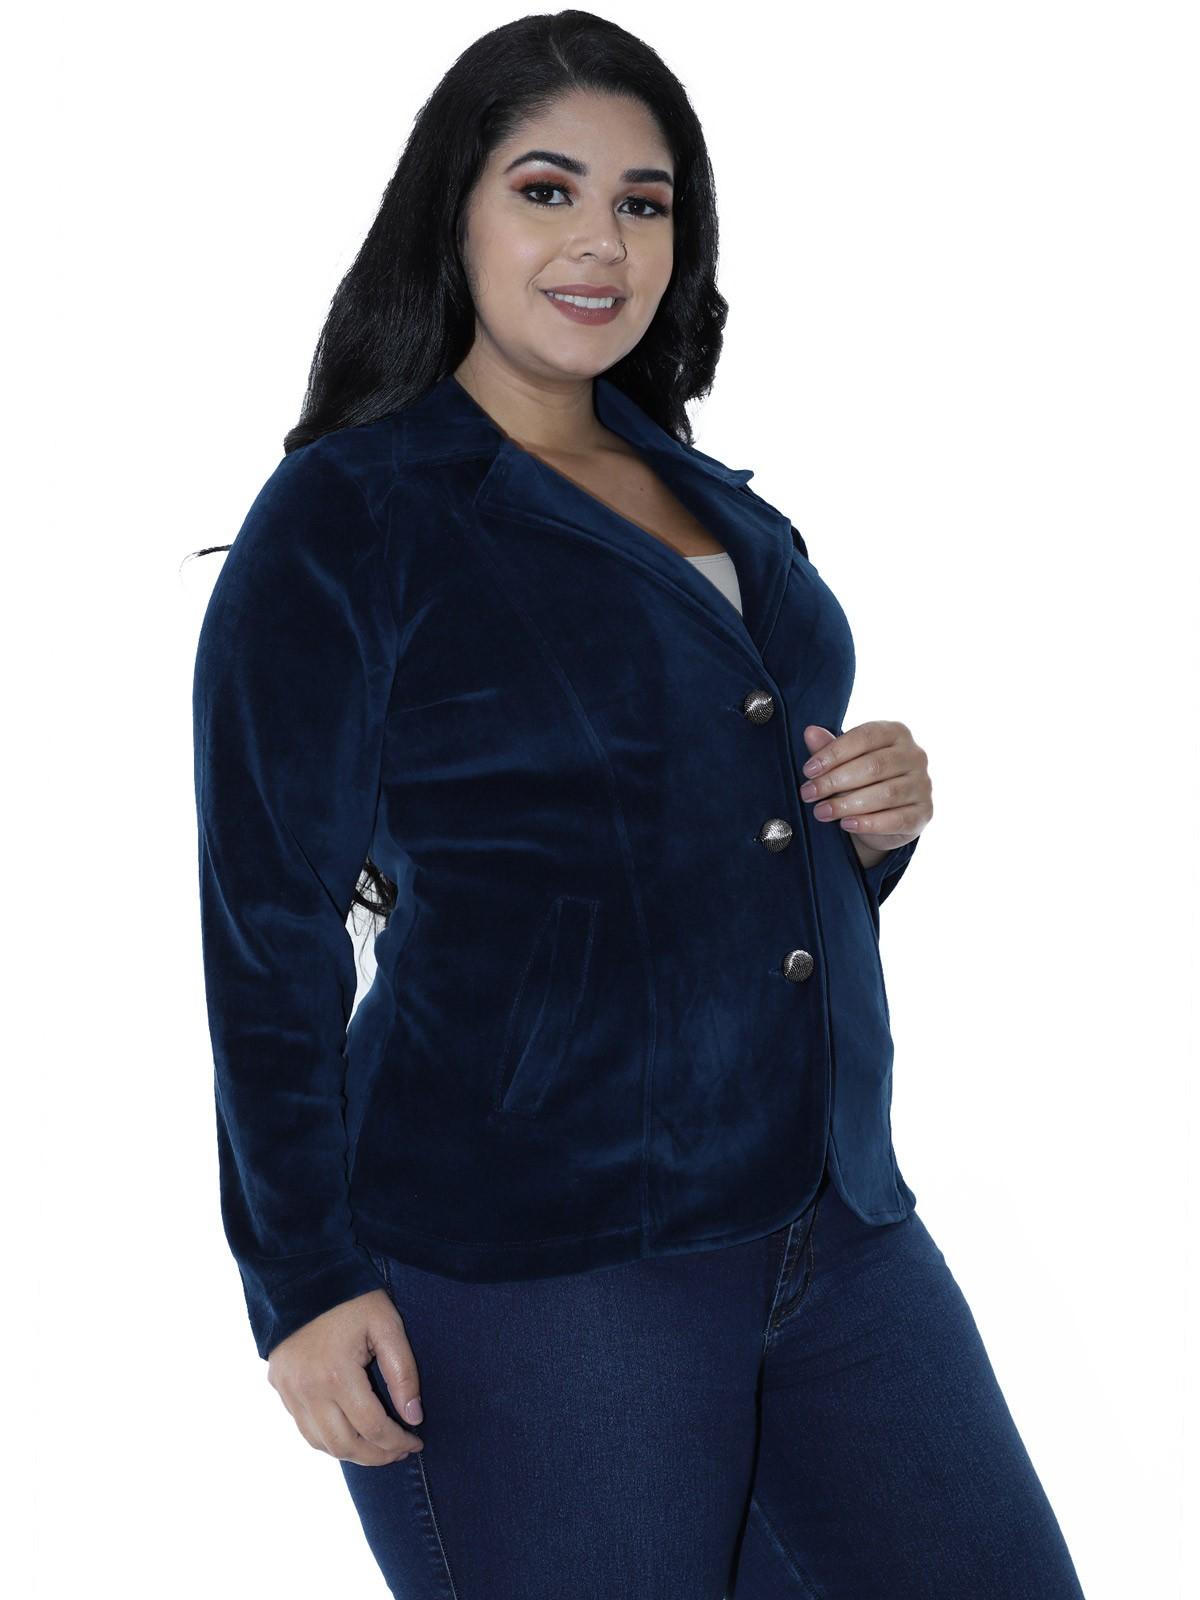 Casaco Plus Size Feminino de Plush Azul Marinho